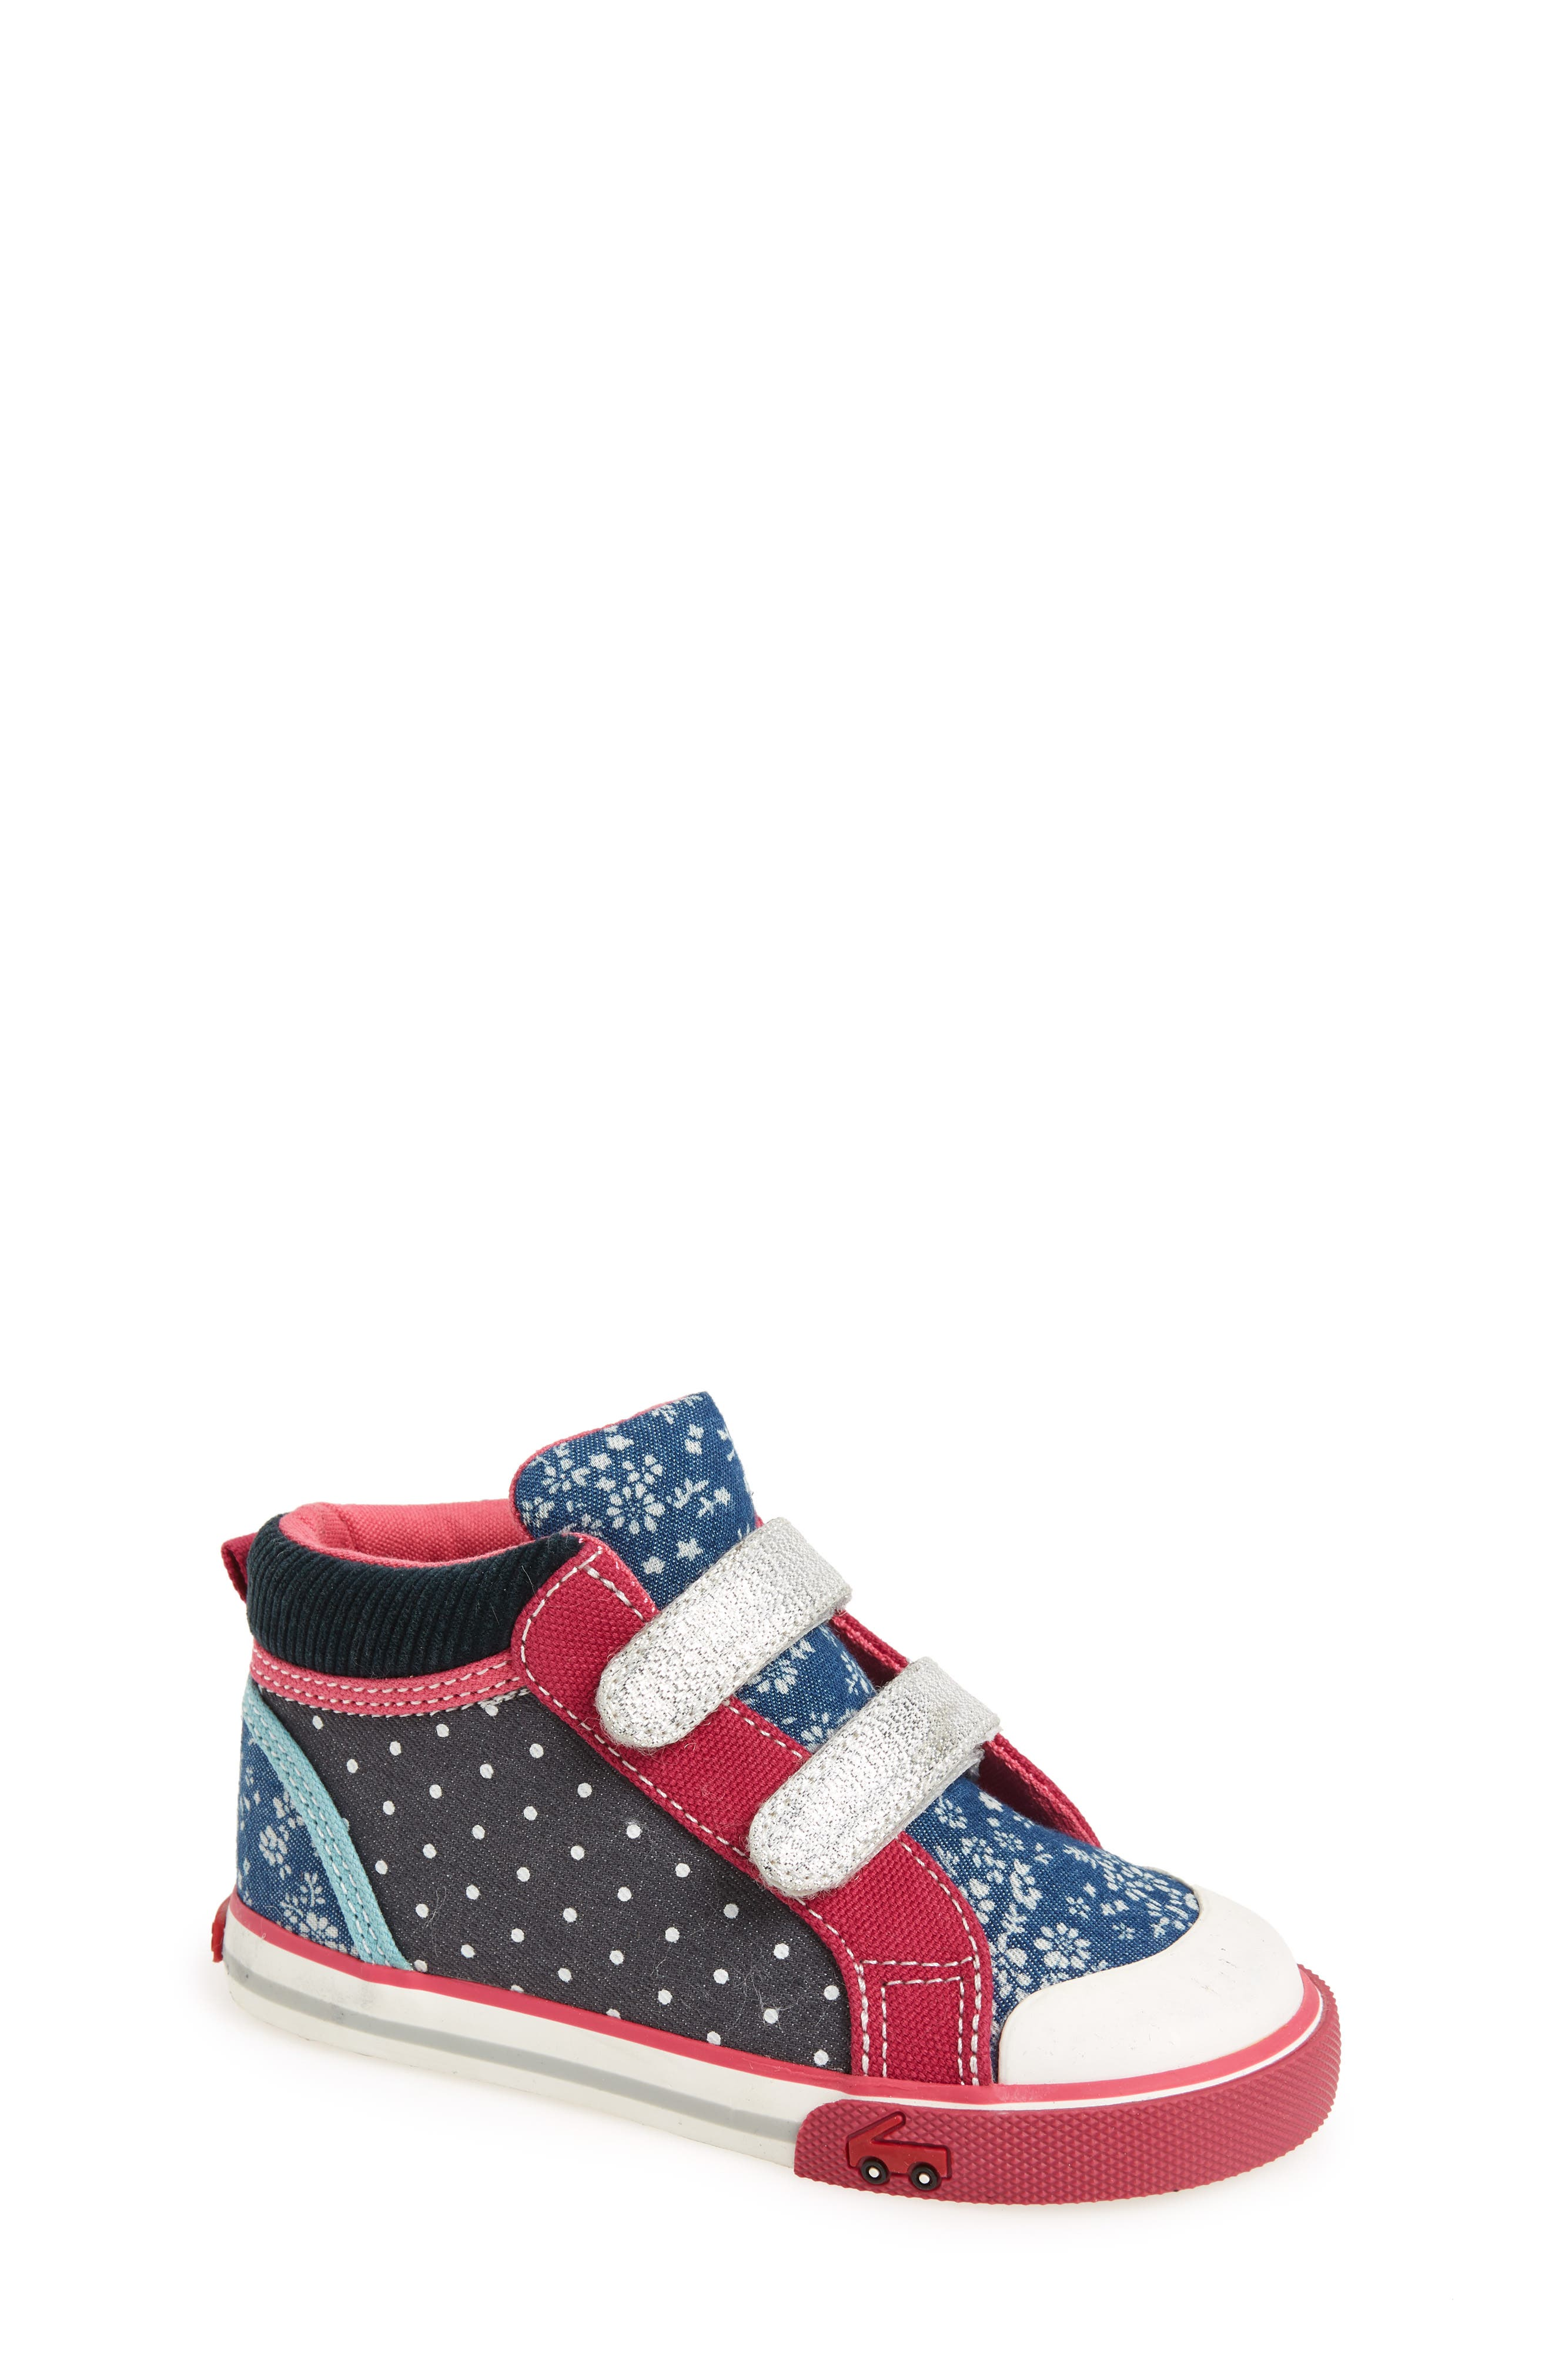 Kya Sneaker,                             Main thumbnail 1, color,                             Navy Corduroy/ Multi